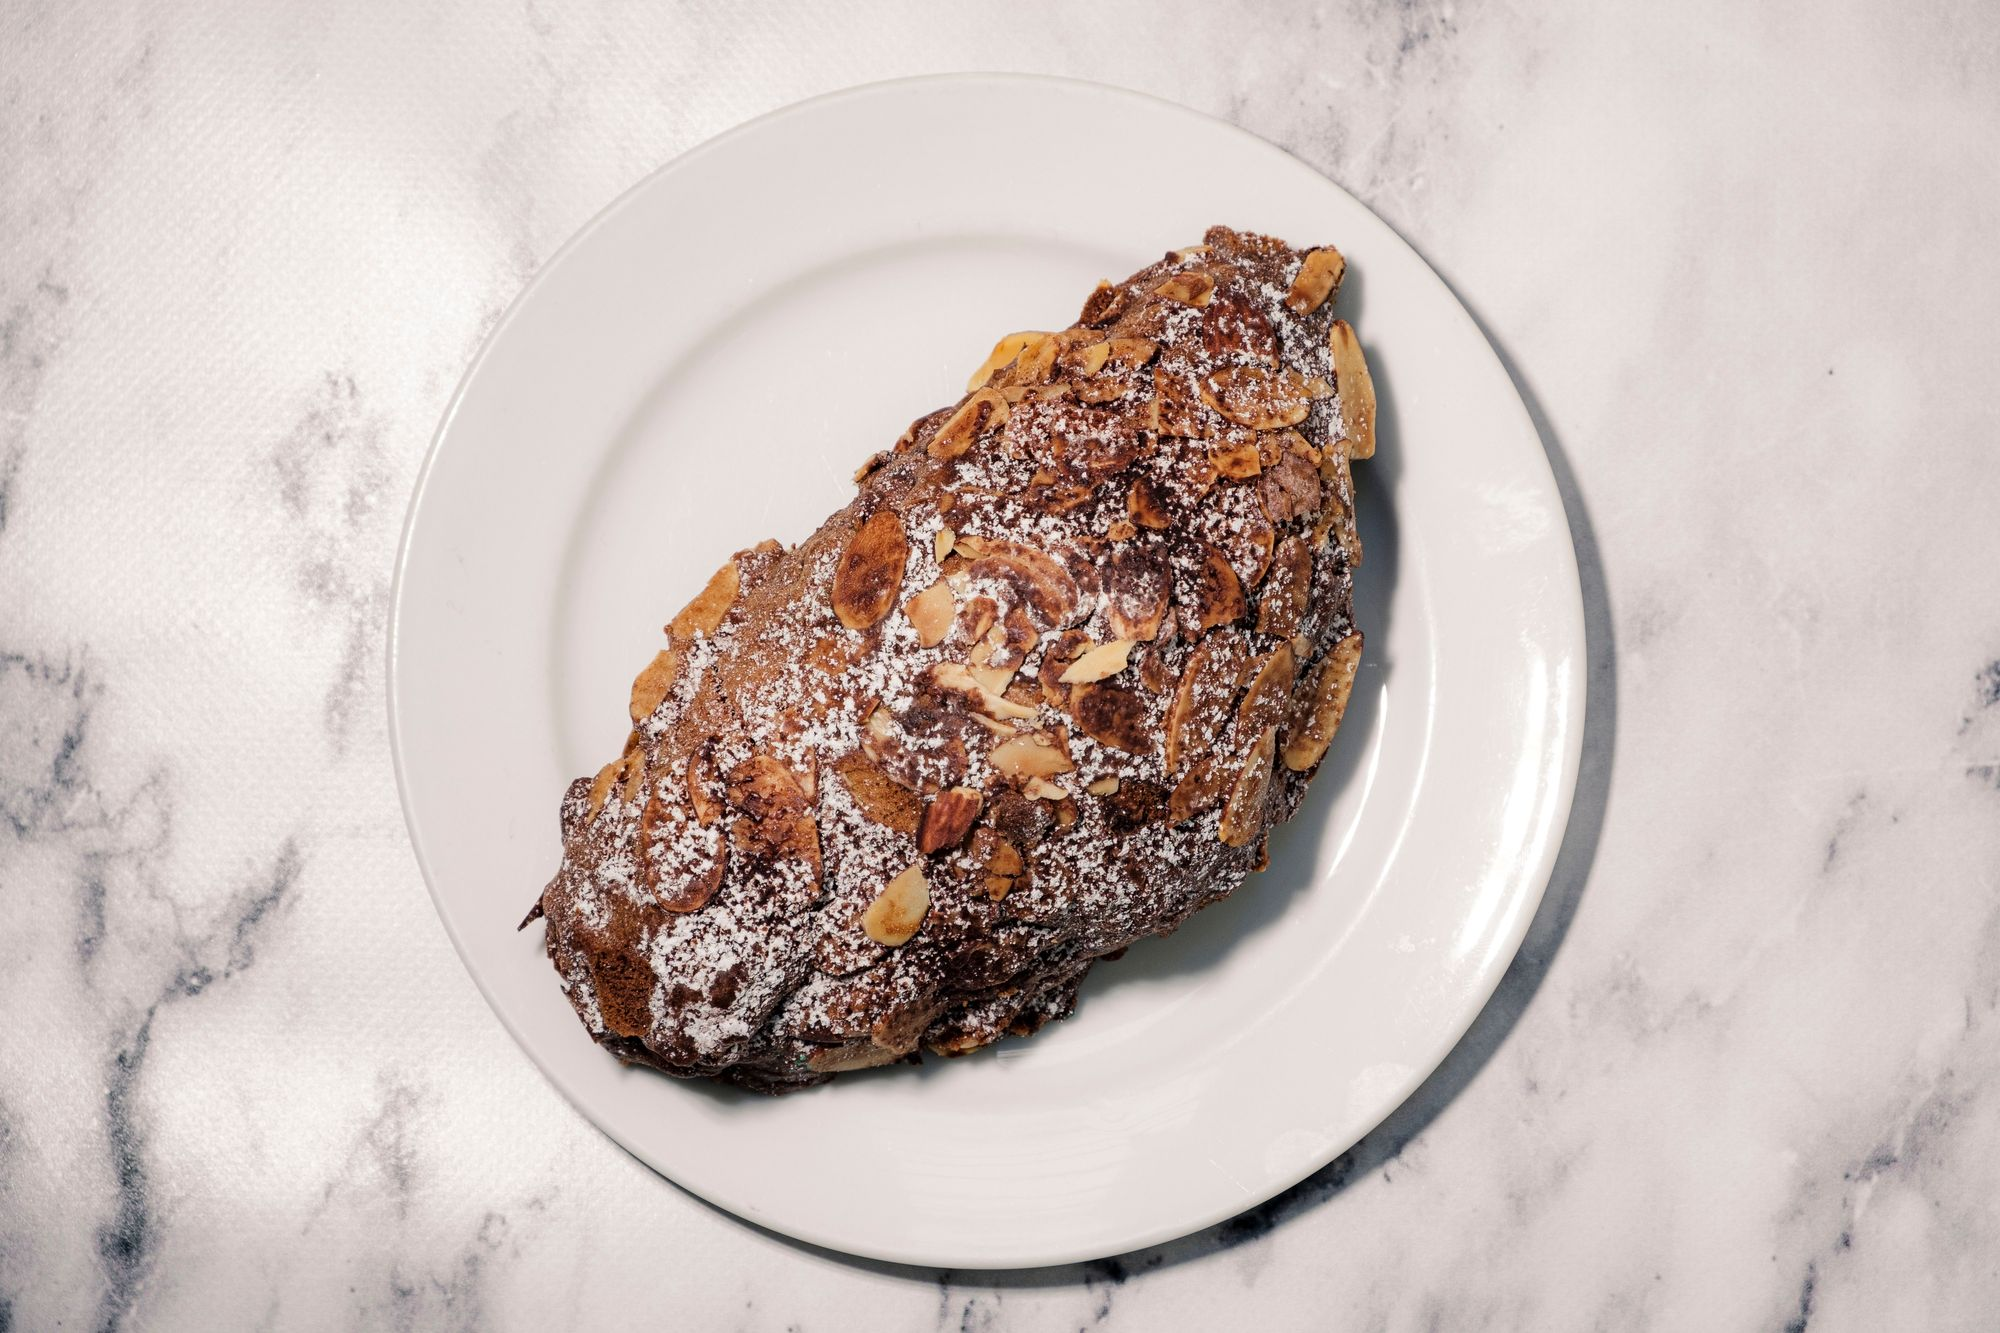 BjornBar Bakery Tiramisu Croissant - Overhead